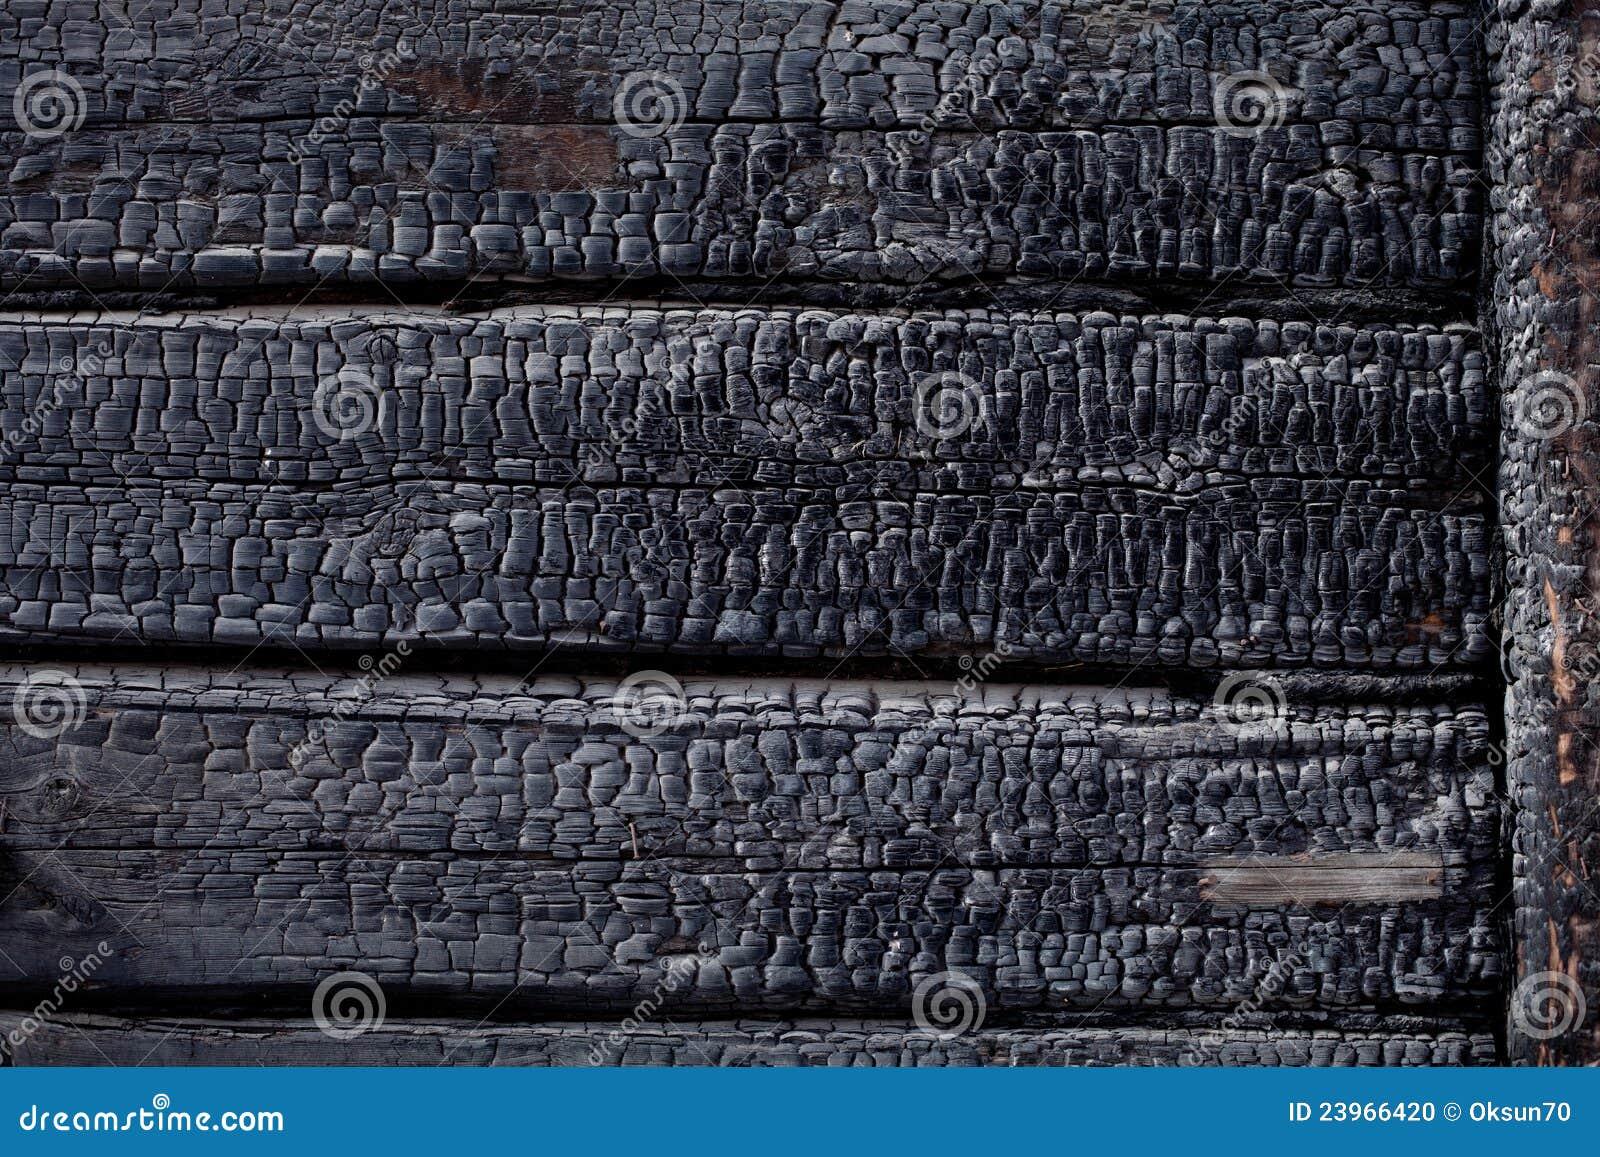 Black burned charred burnt wood background texture